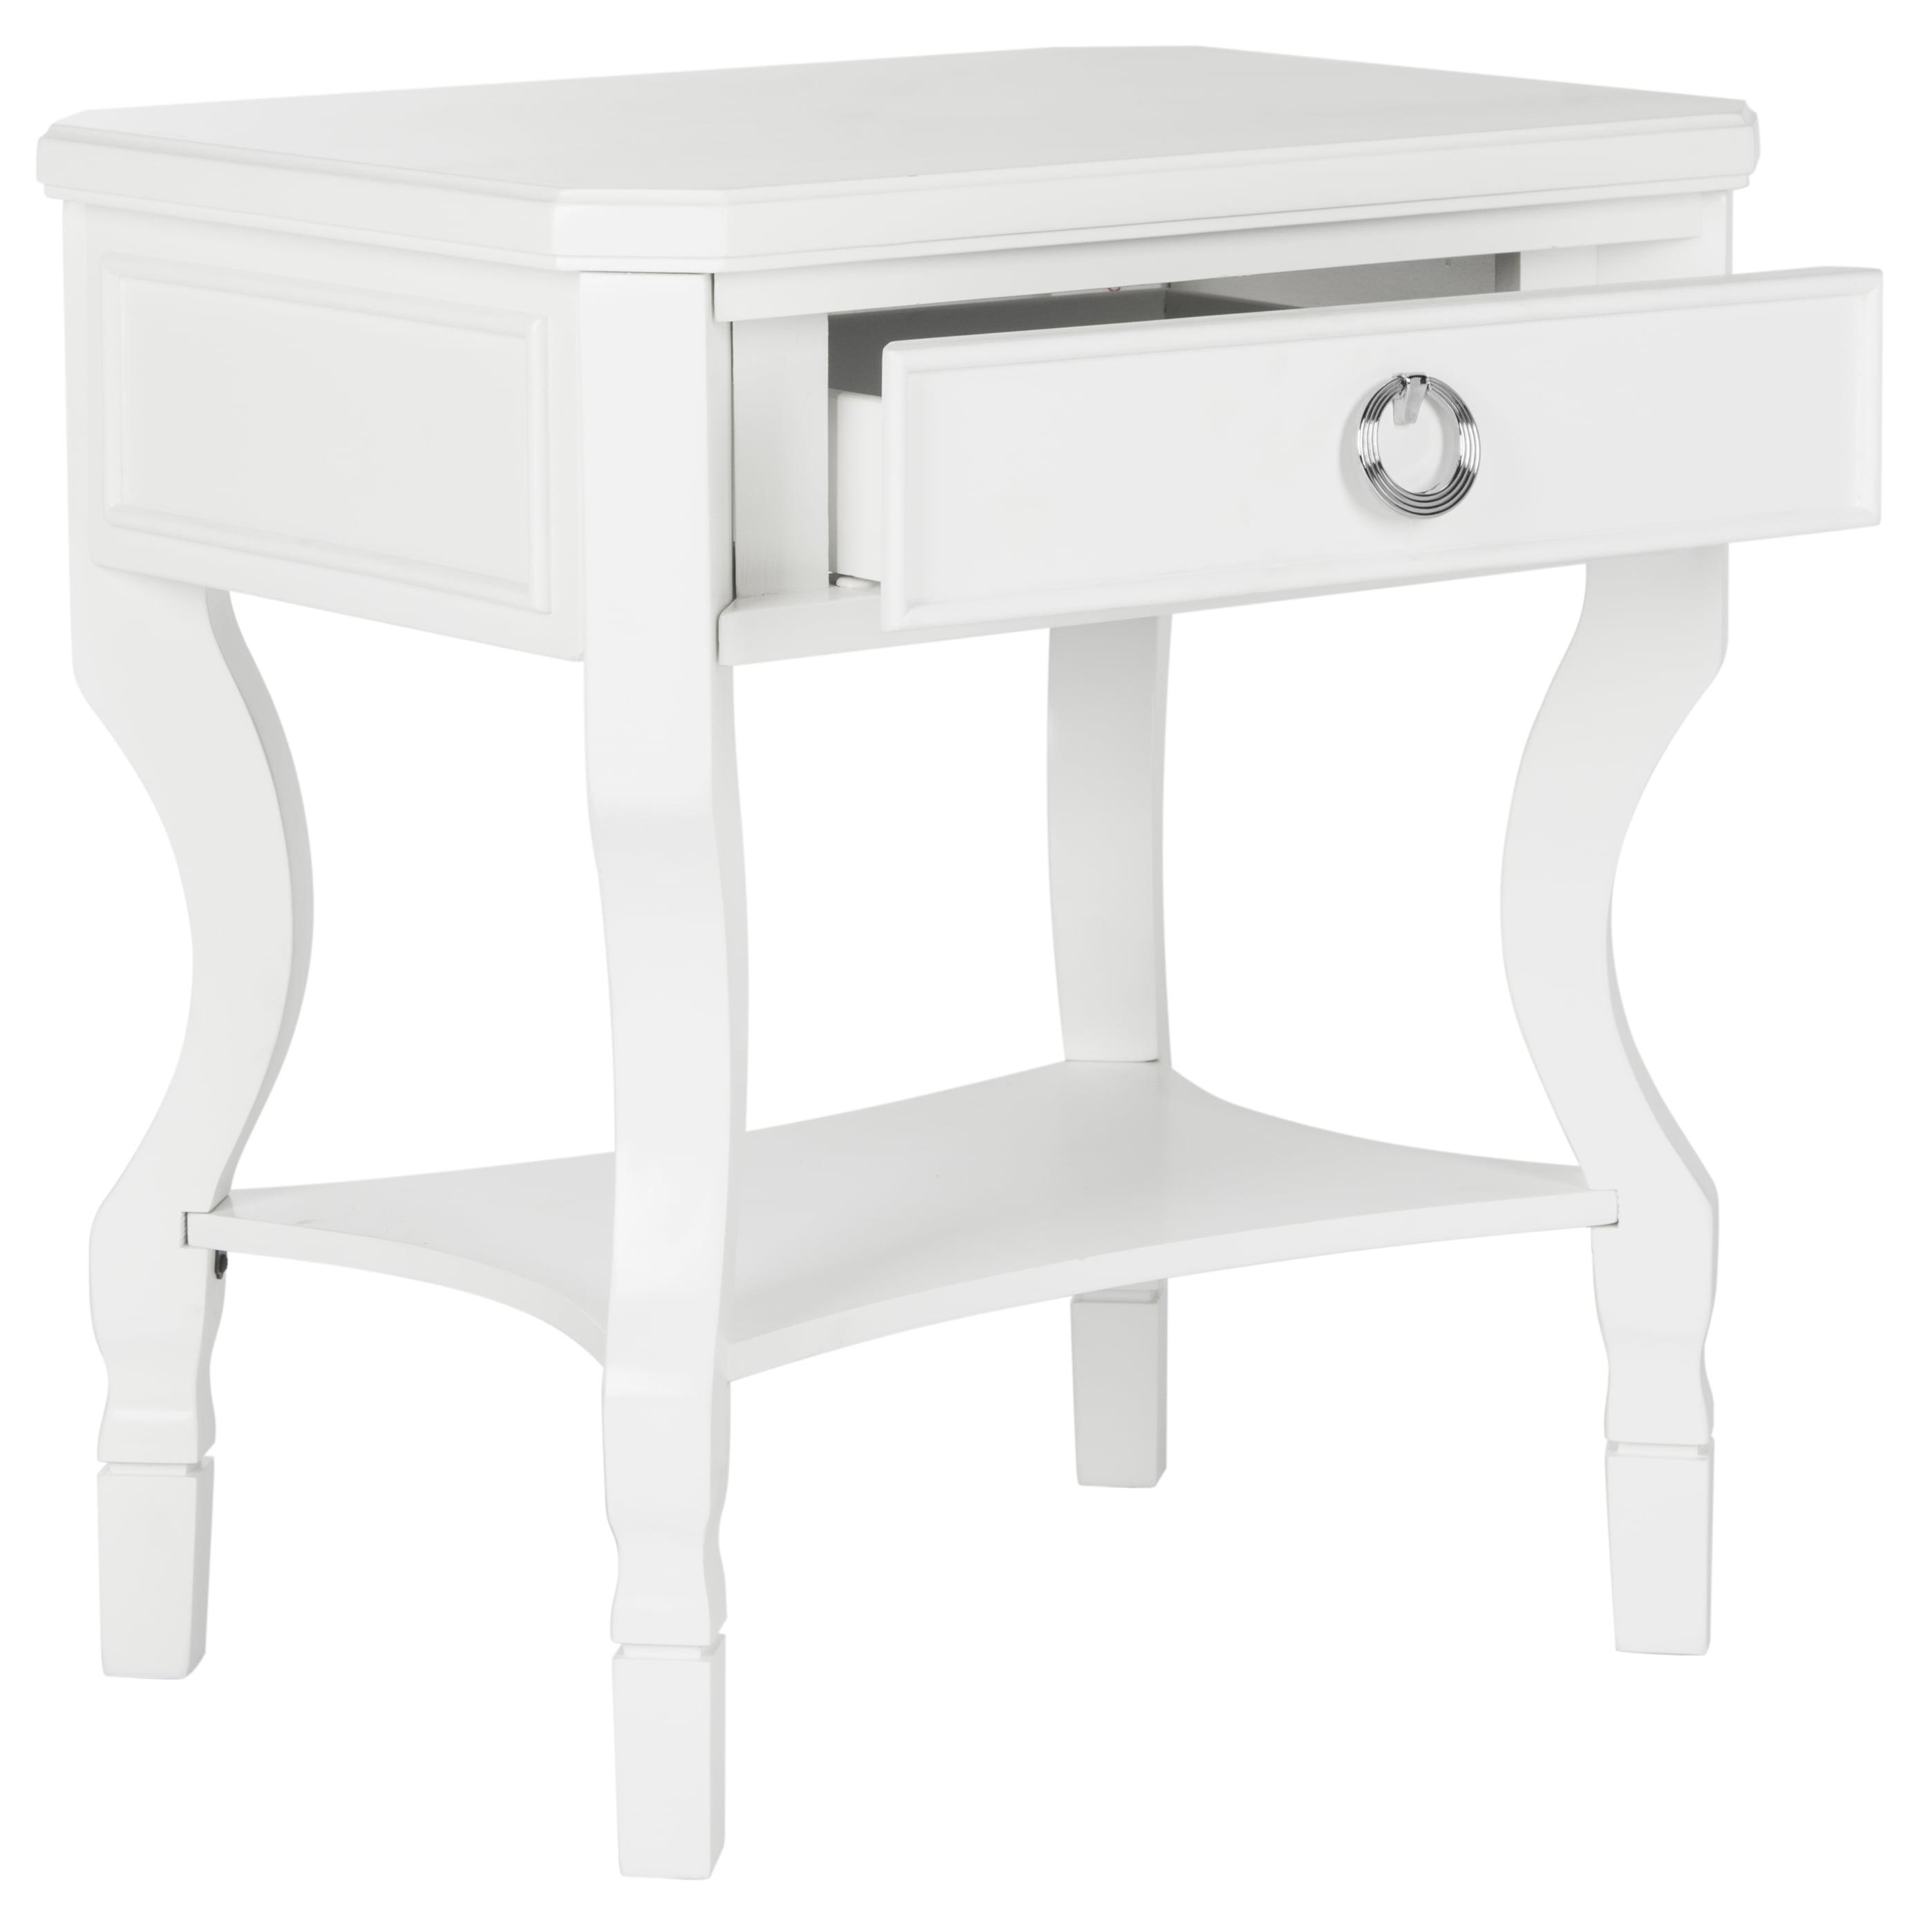 Desks & Secretaries Alert High Gloss Black Desk With Drawer Front To Ensure Smooth Transmission Antiques